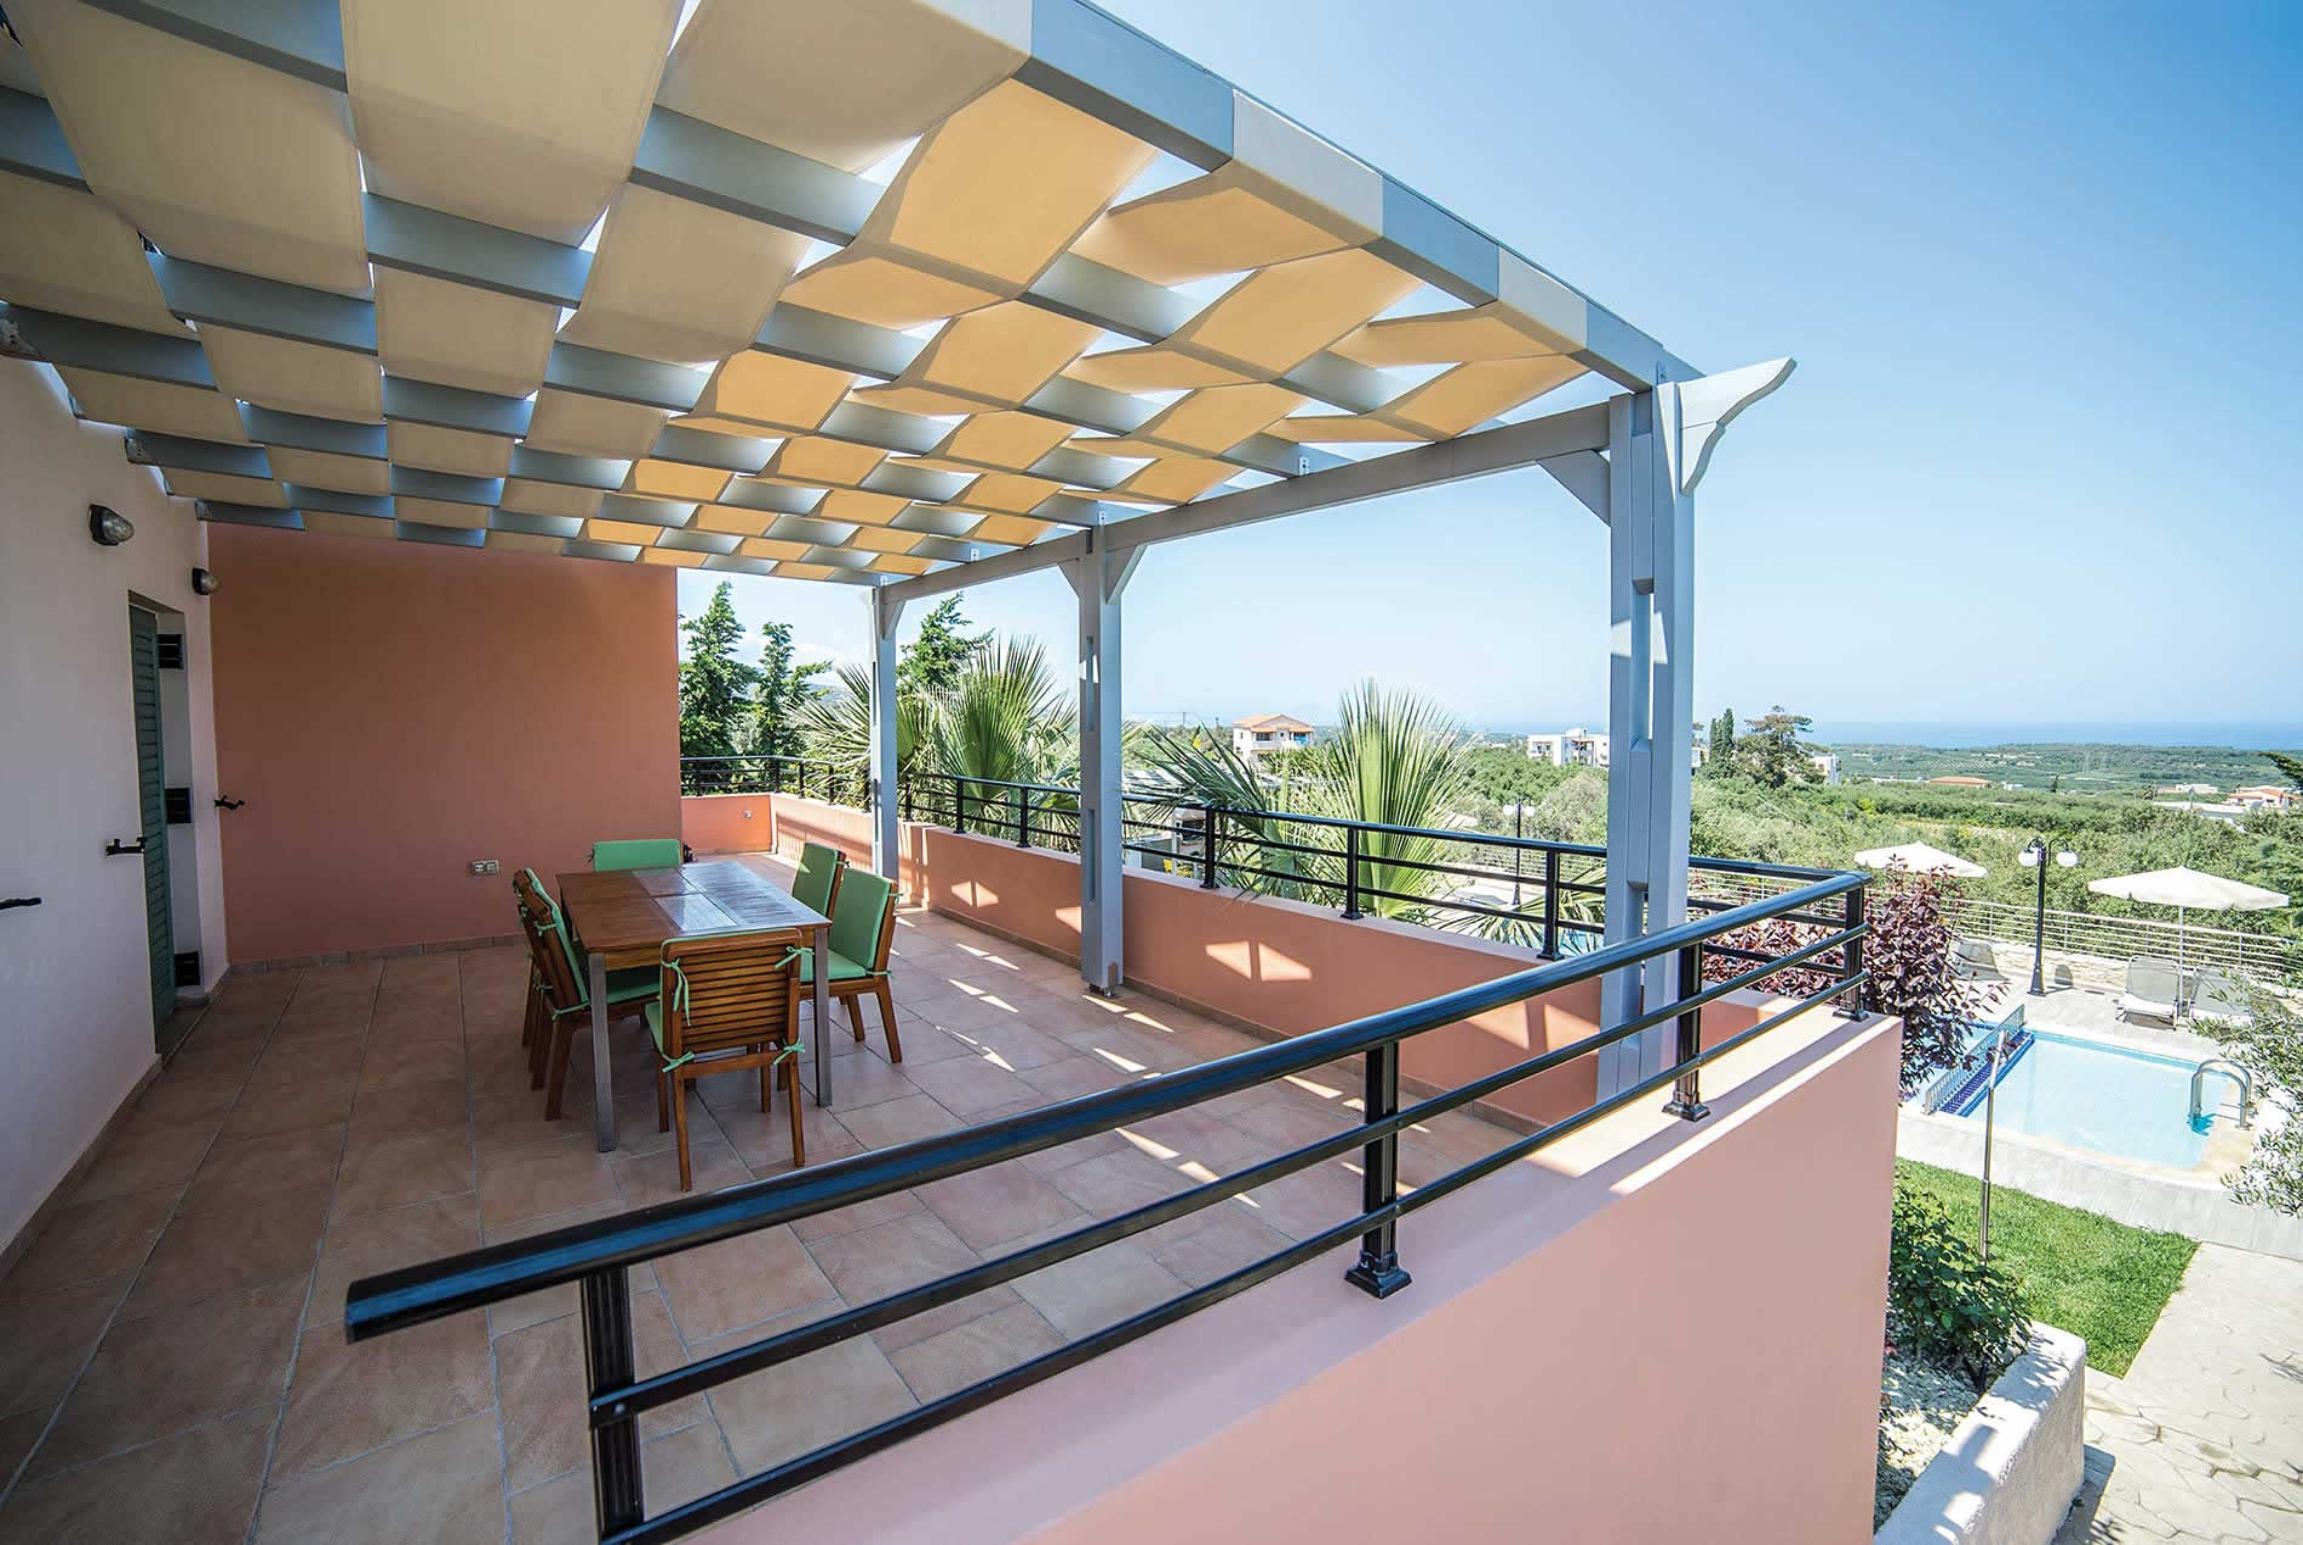 Ferienhaus Kyveli (2654321), Rethymno, Kreta Nordküste, Kreta, Griechenland, Bild 17